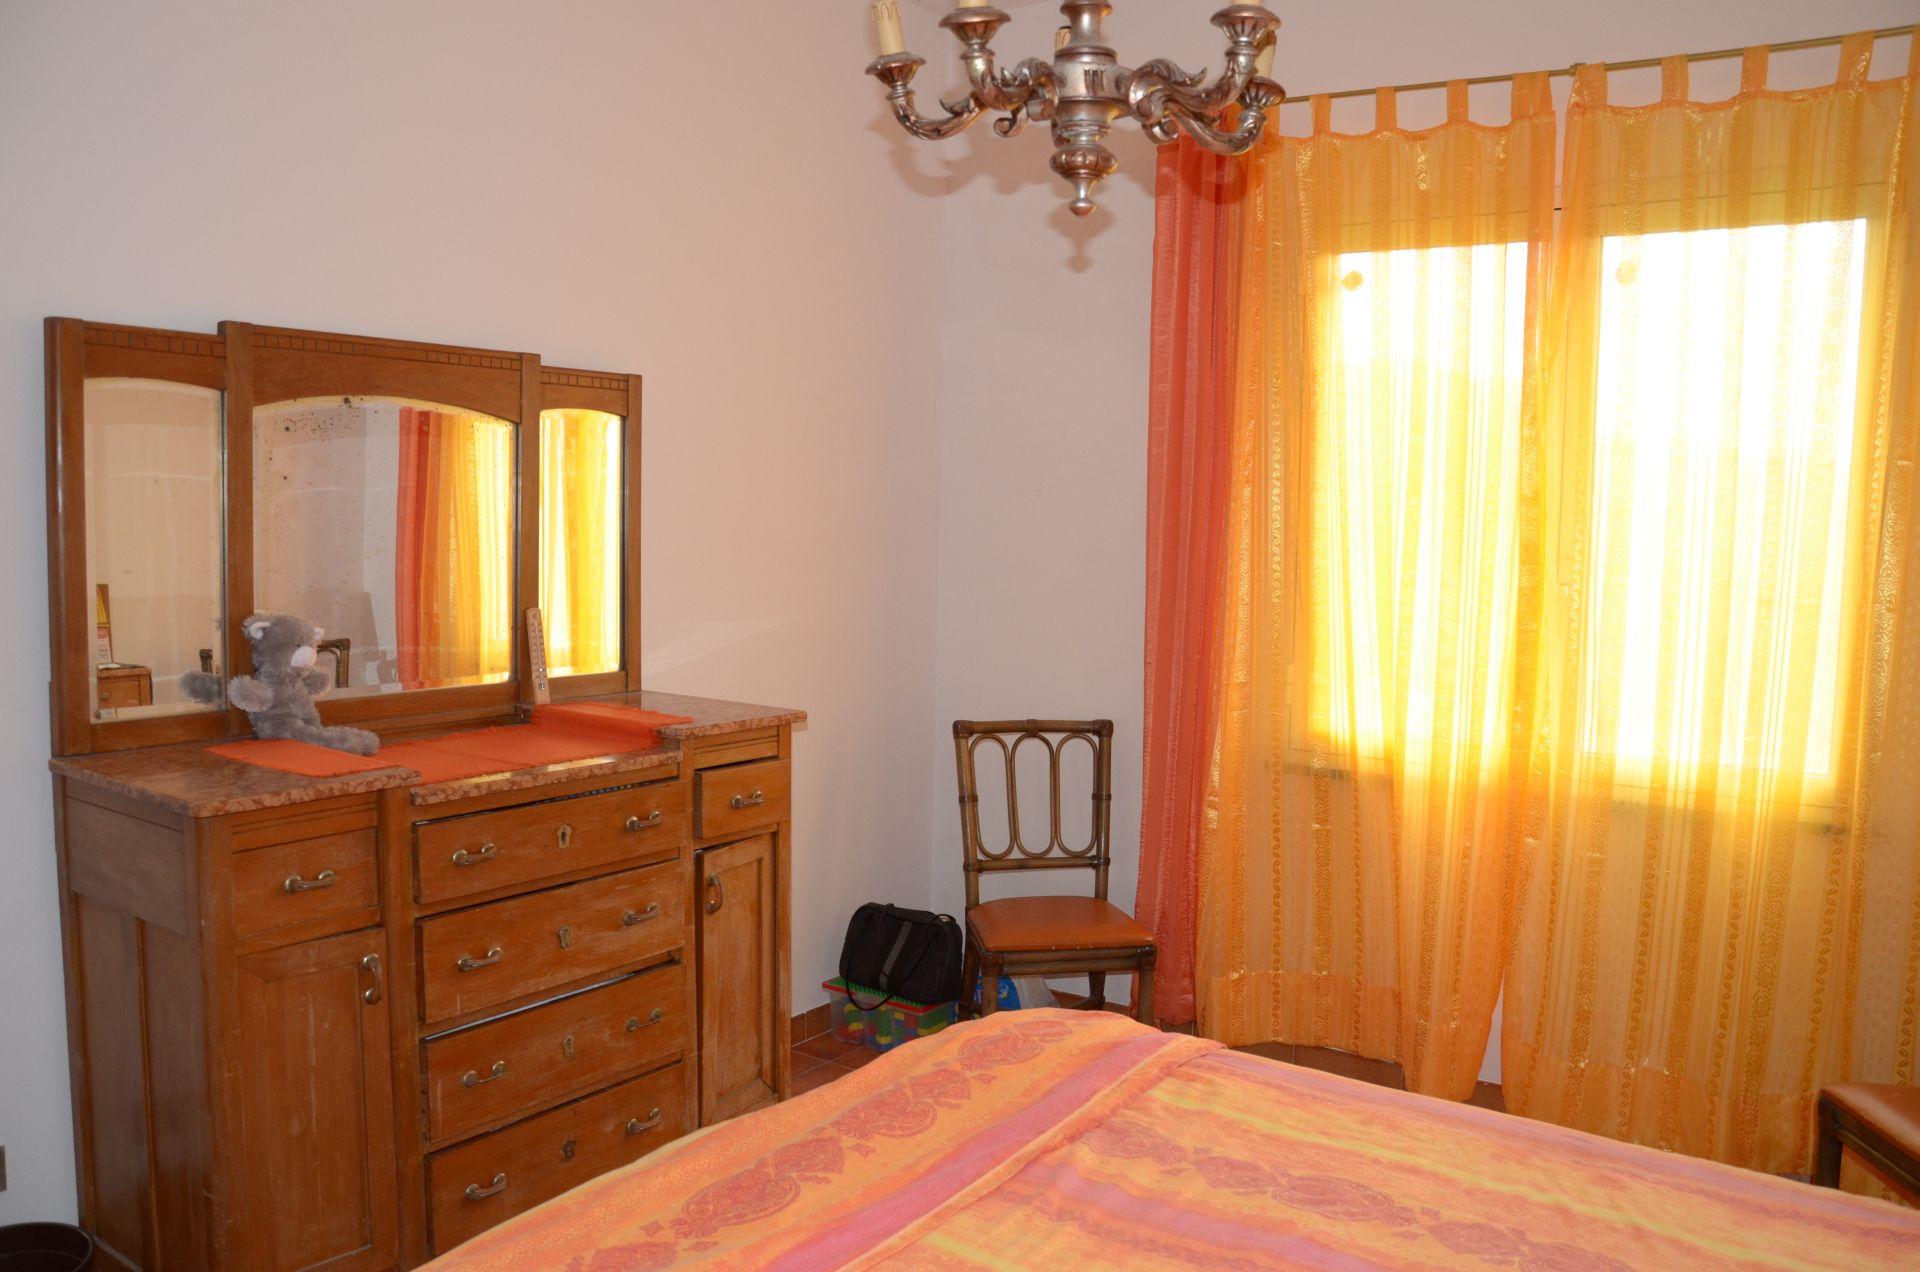 affitto casa vacanze mare castelsardo 441 (20140403190403-2014-41962-NDP.jpg)